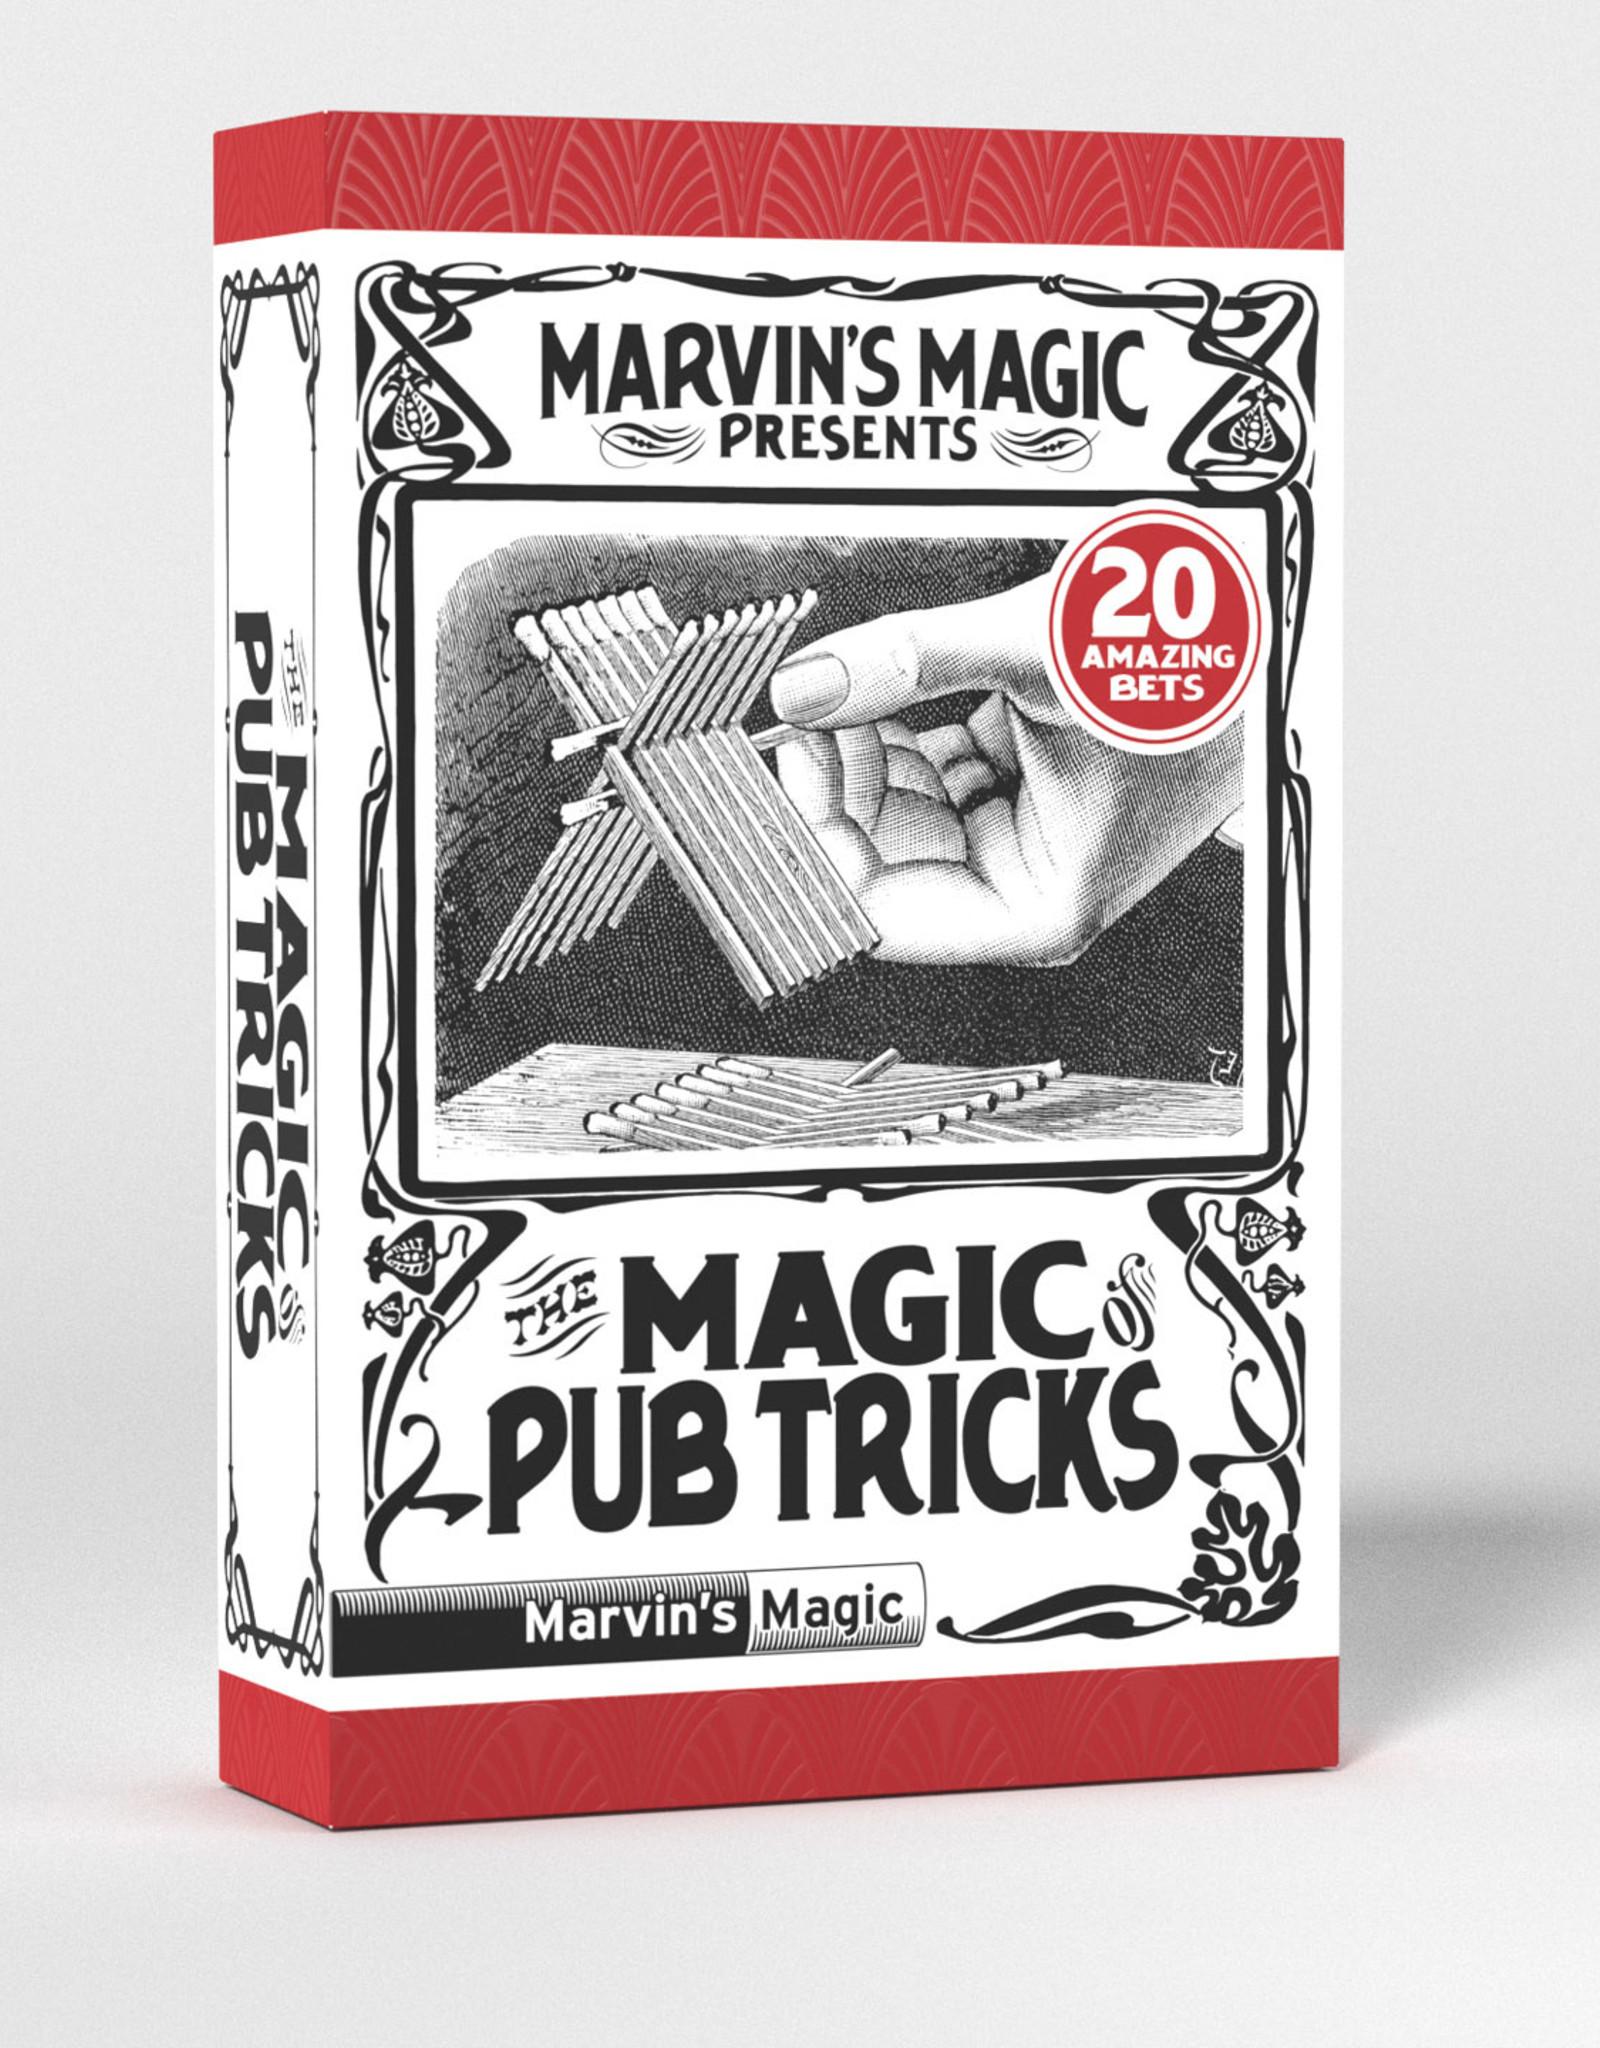 Marvin's Magic Marvin's Magic of Pub Tricks